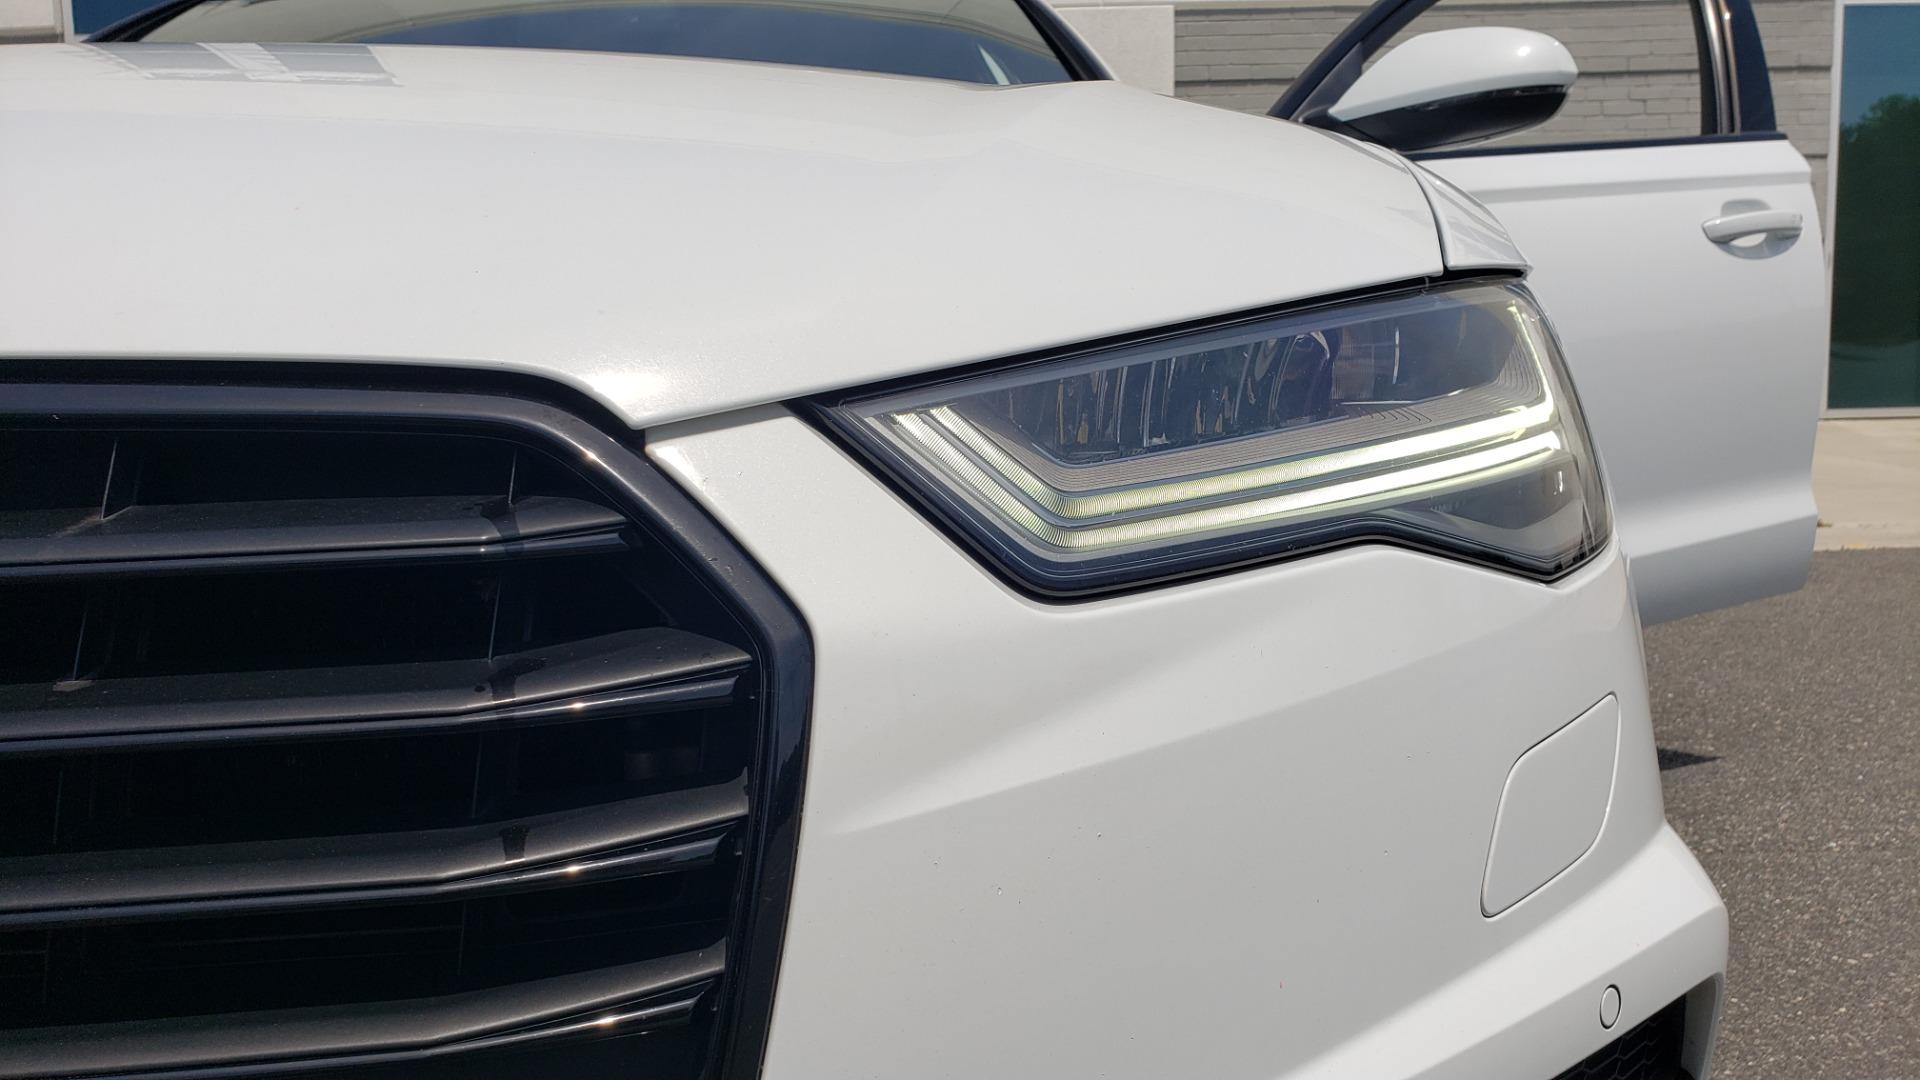 Used 2017 Audi A6 PRESTIGE SEDAN 3.0T / NAV / SUNROOF / BLACK OPTIC / CLD WTHR / REARVIEW for sale $30,797 at Formula Imports in Charlotte NC 28227 24